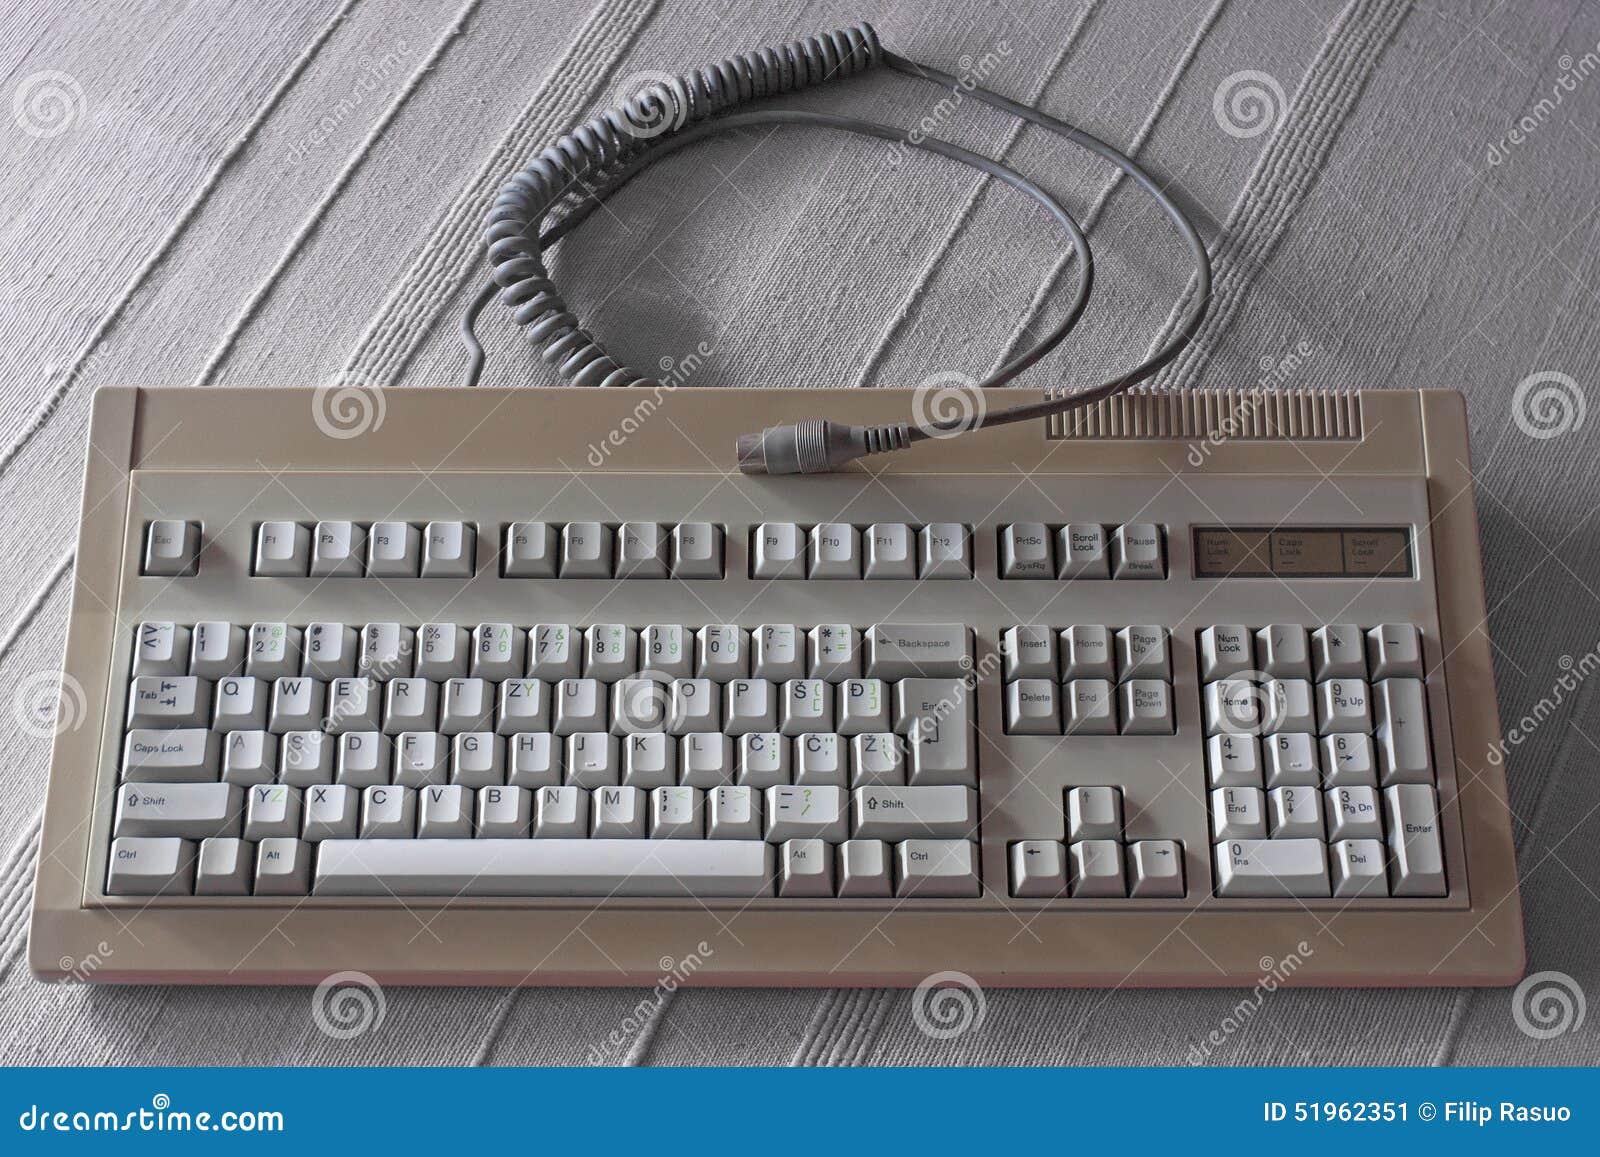 Old keyboard stock image  Image of input, enter, device